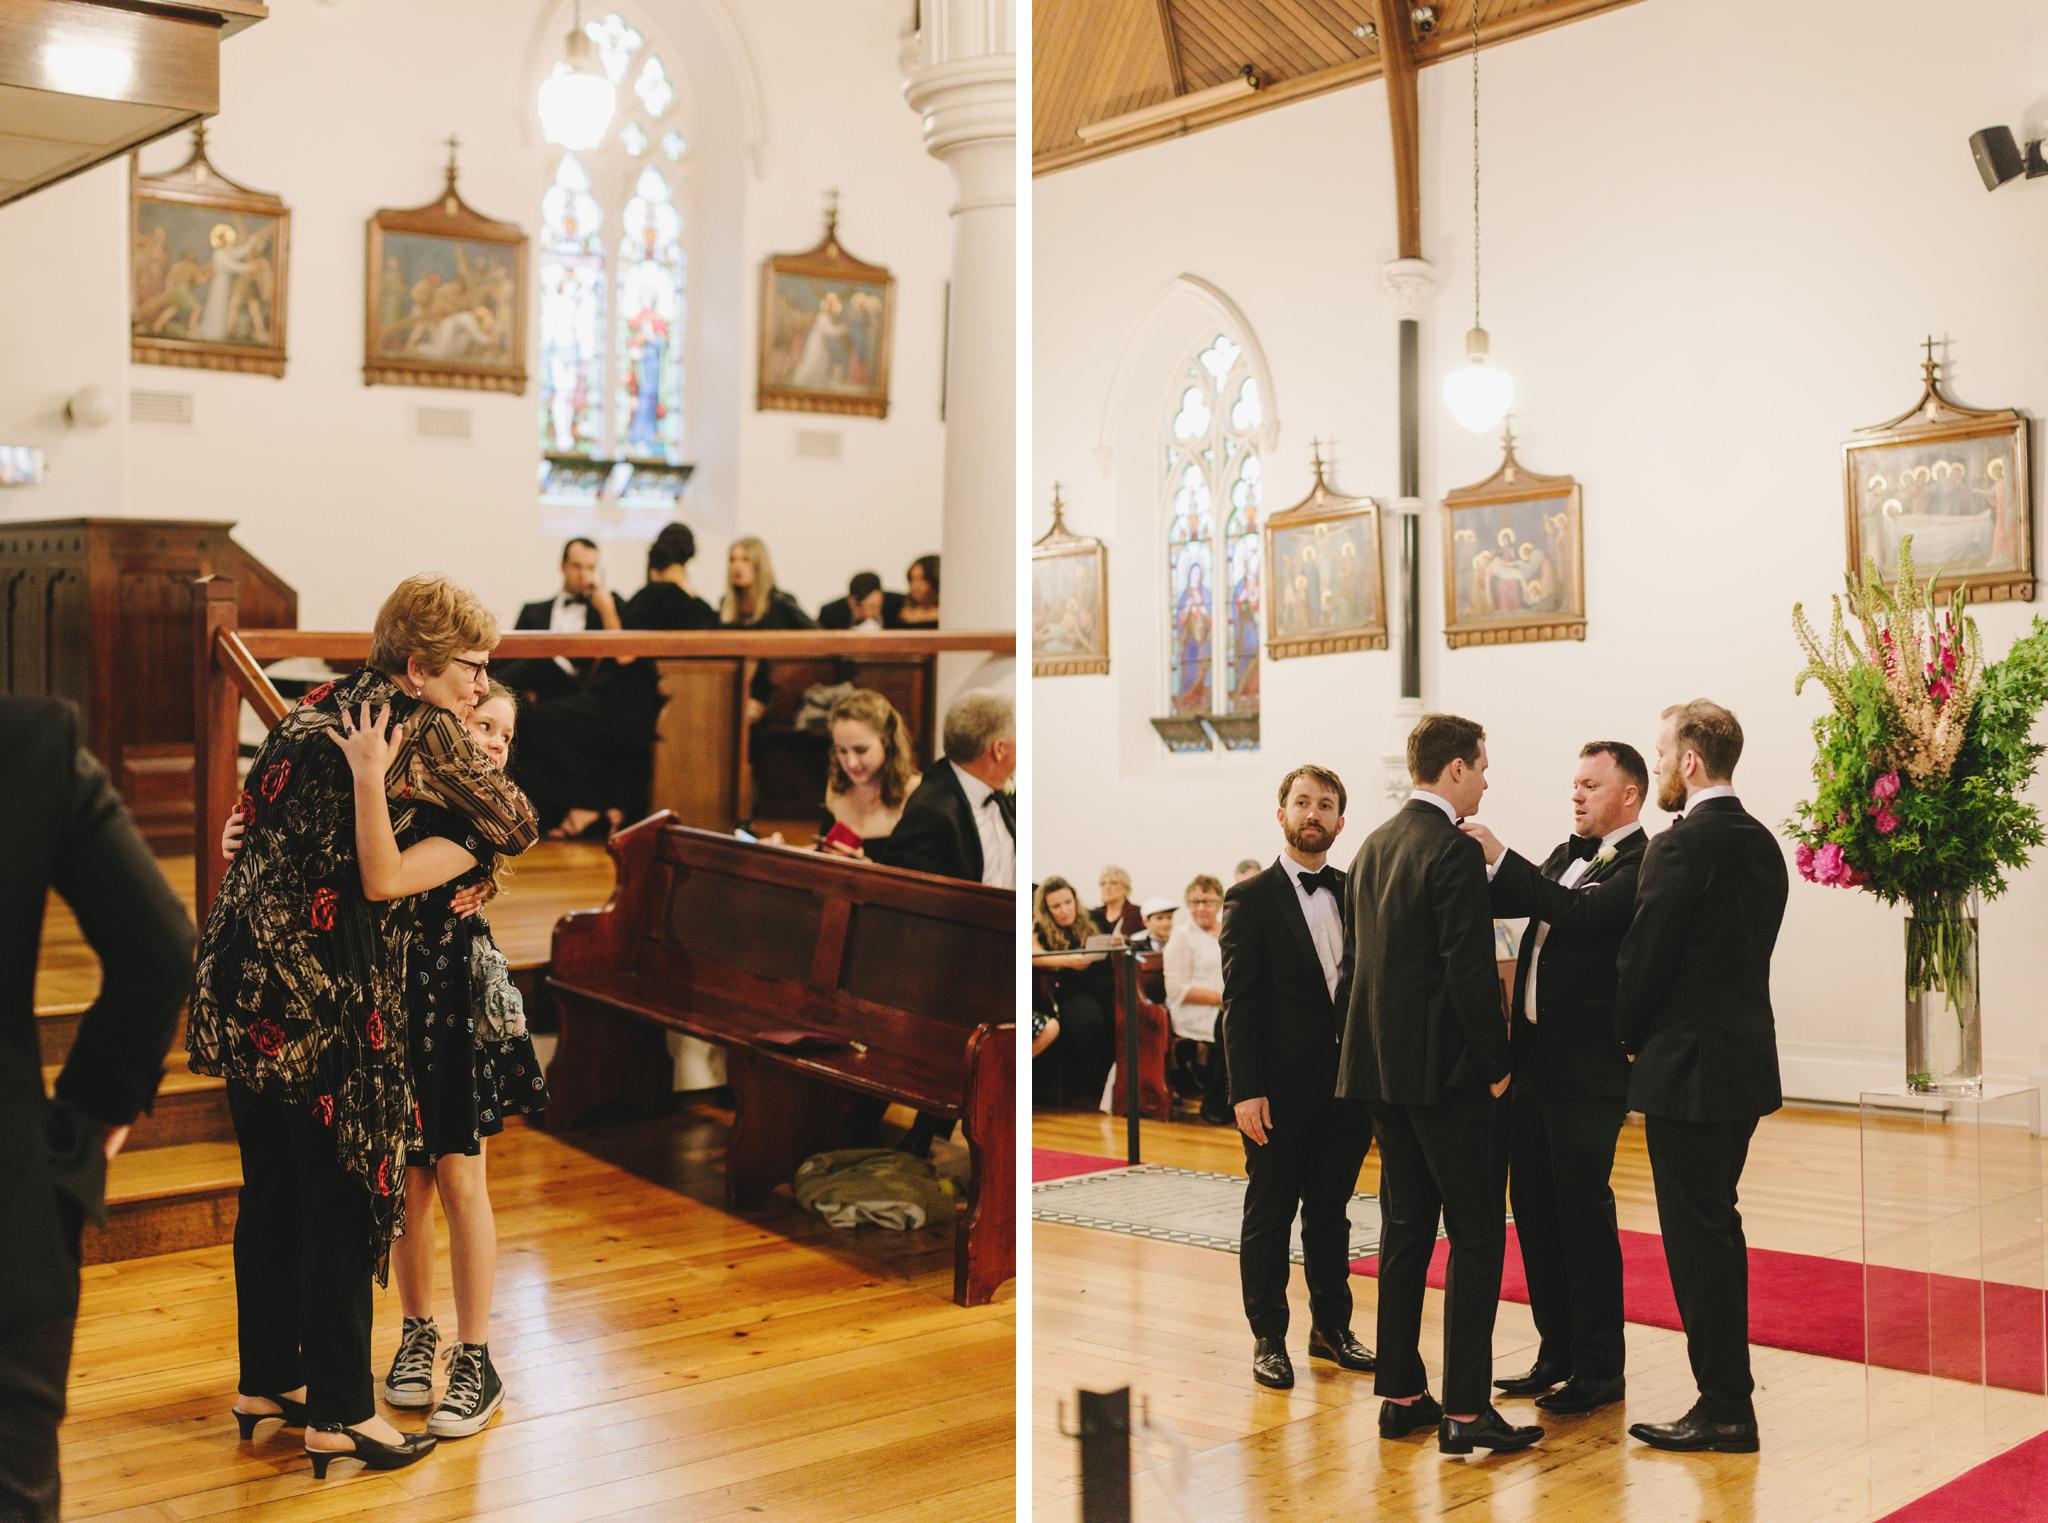 Abbotsford_Convent_Wedding_Peter_Anna042.JPG